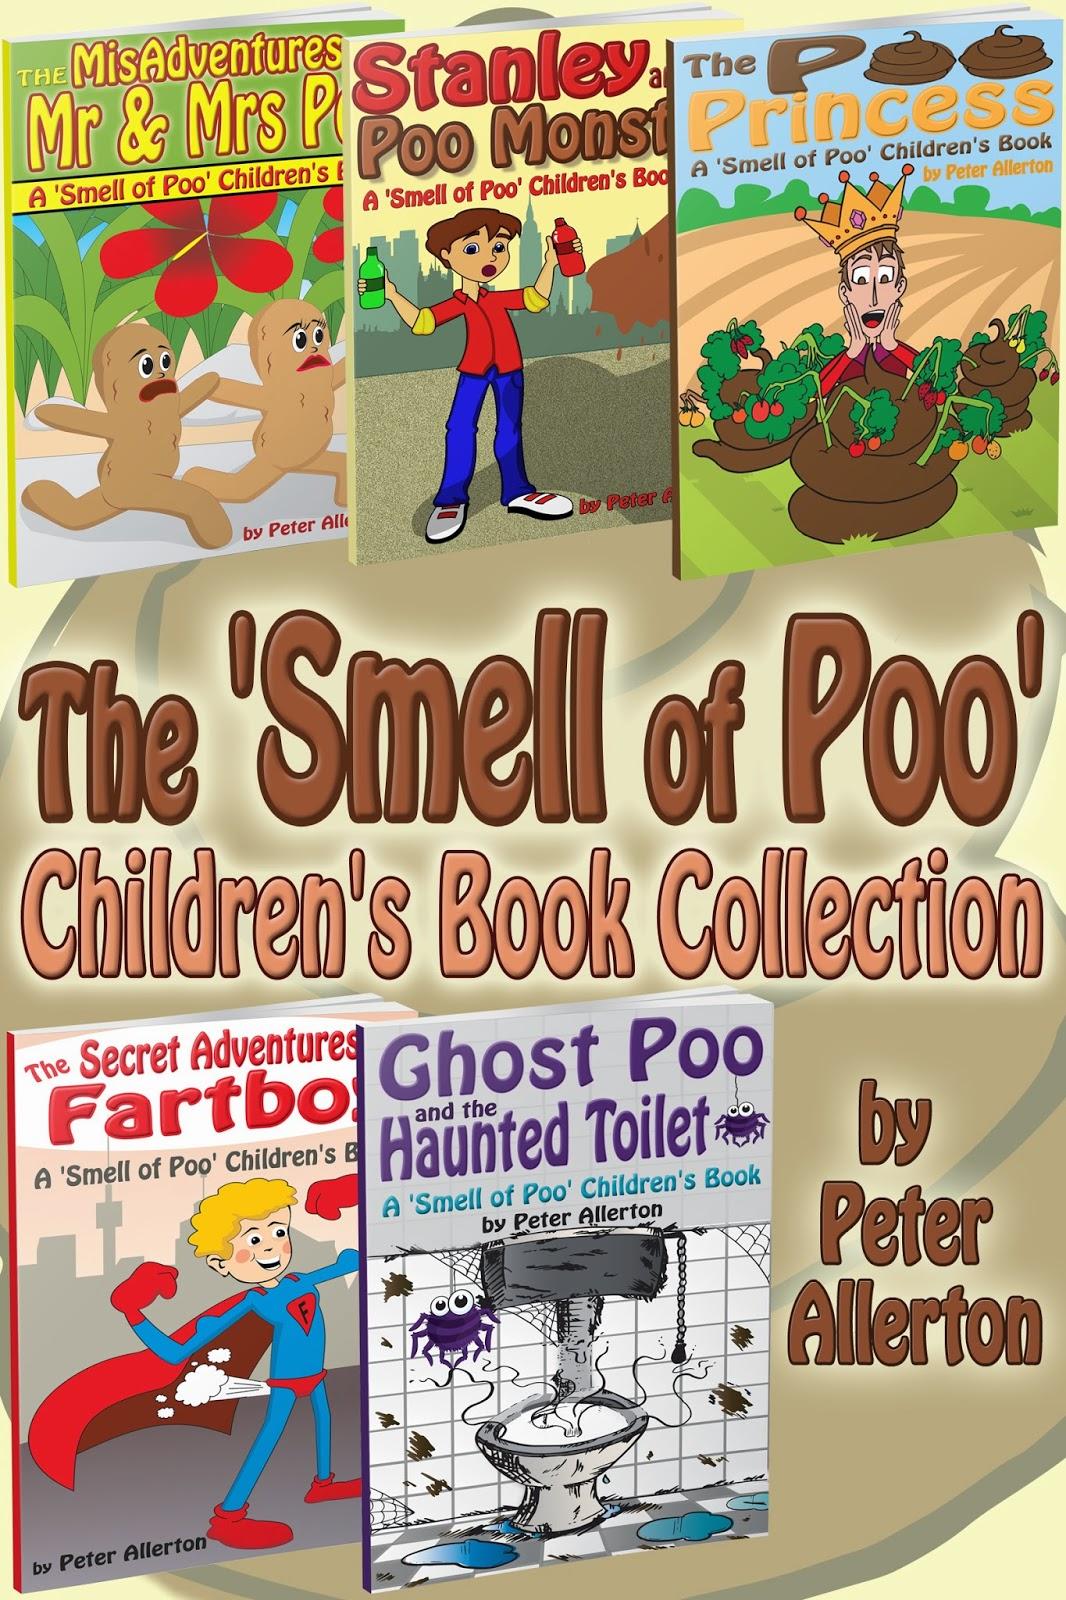 humorous kids' book